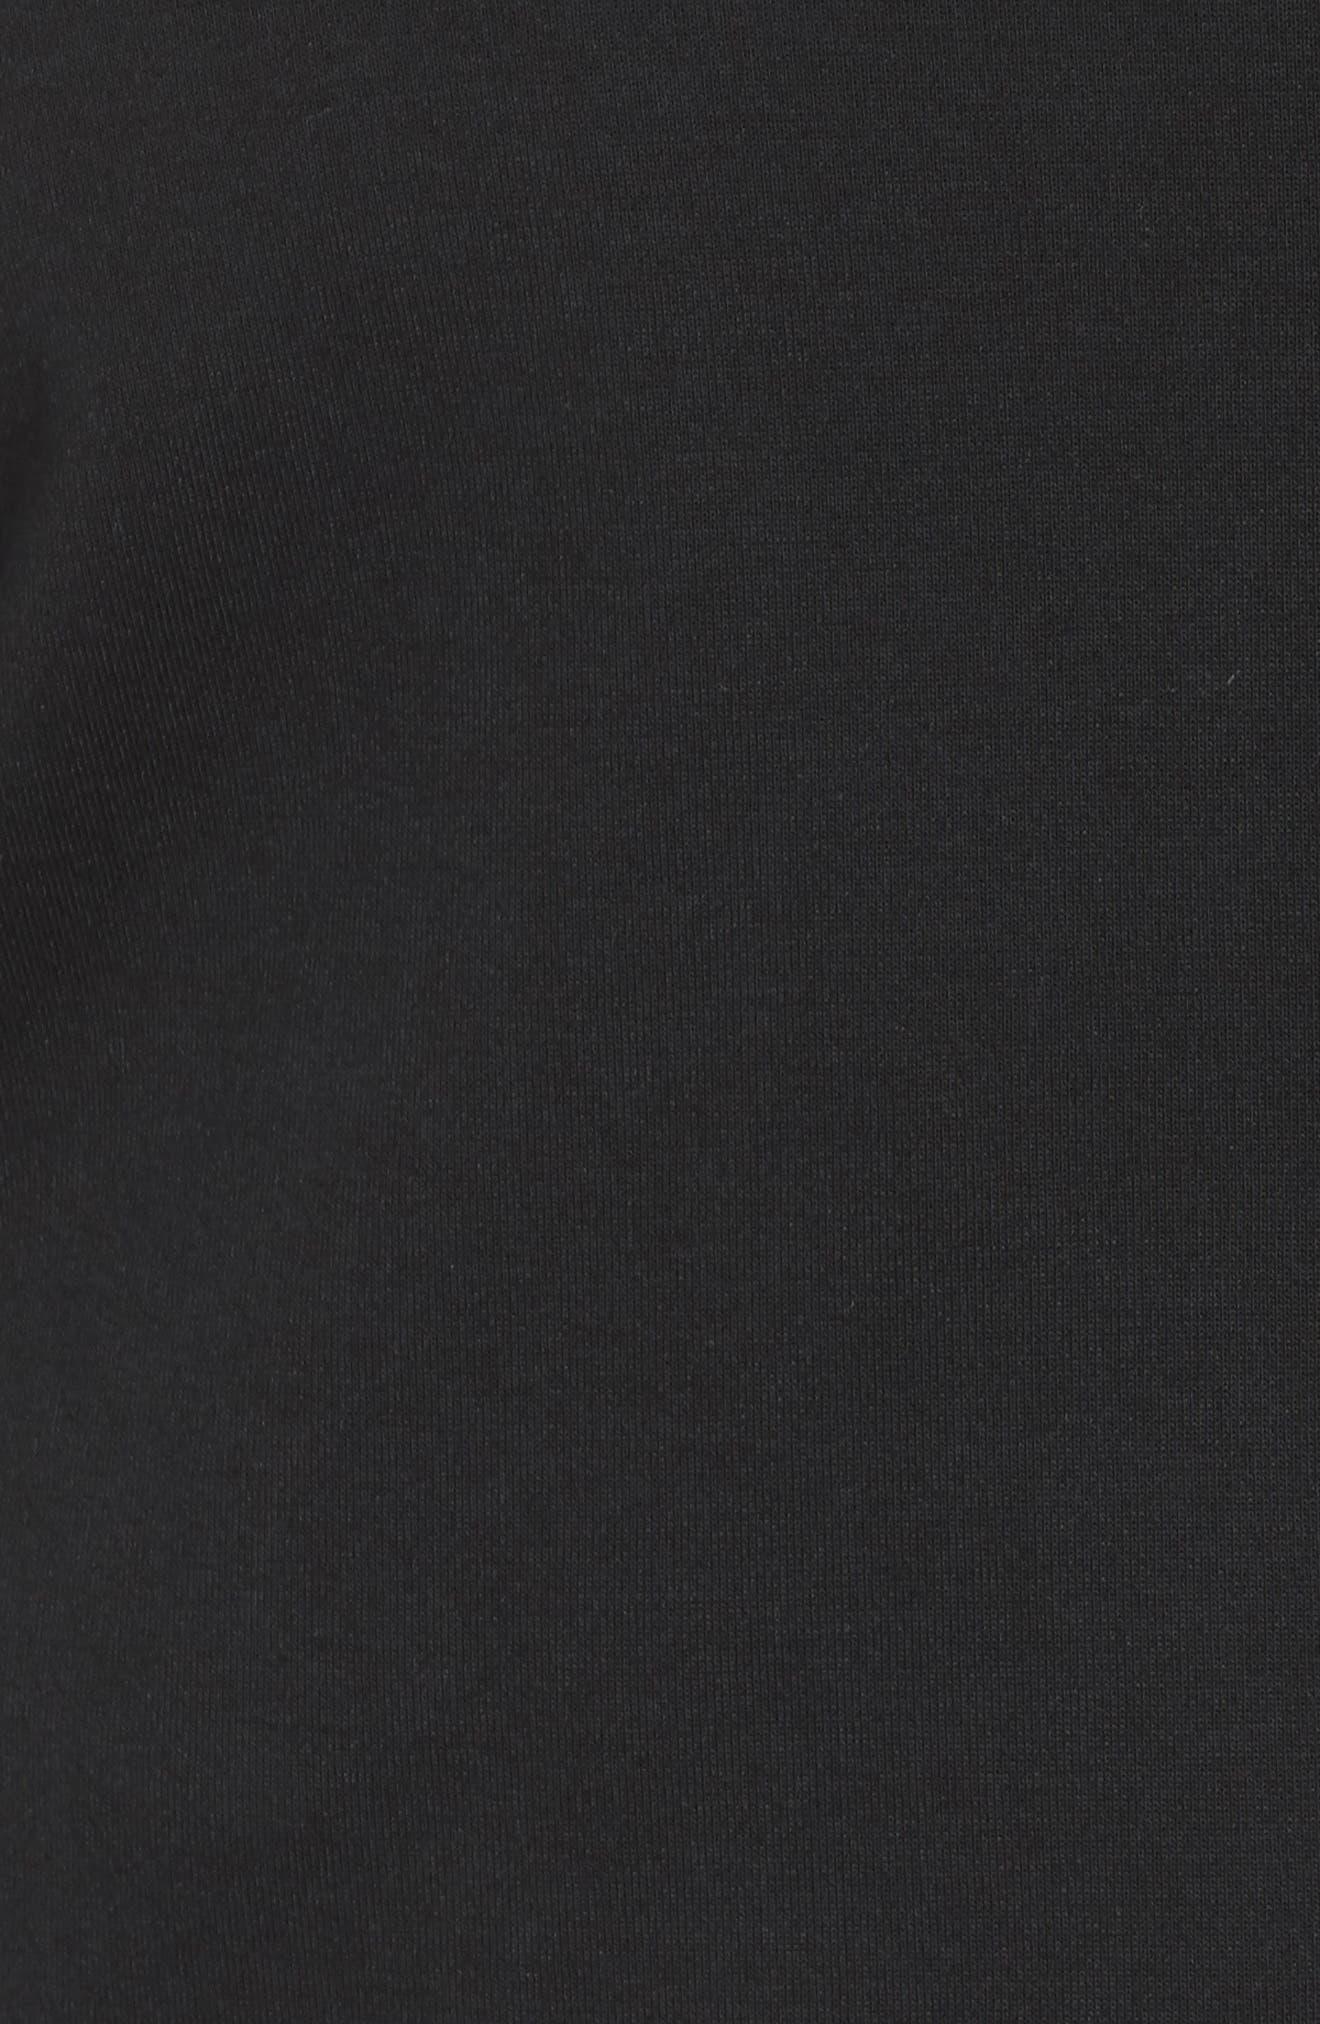 Sportswear Tech Fleece Zip Cape,                             Alternate thumbnail 5, color,                             Black/ Black